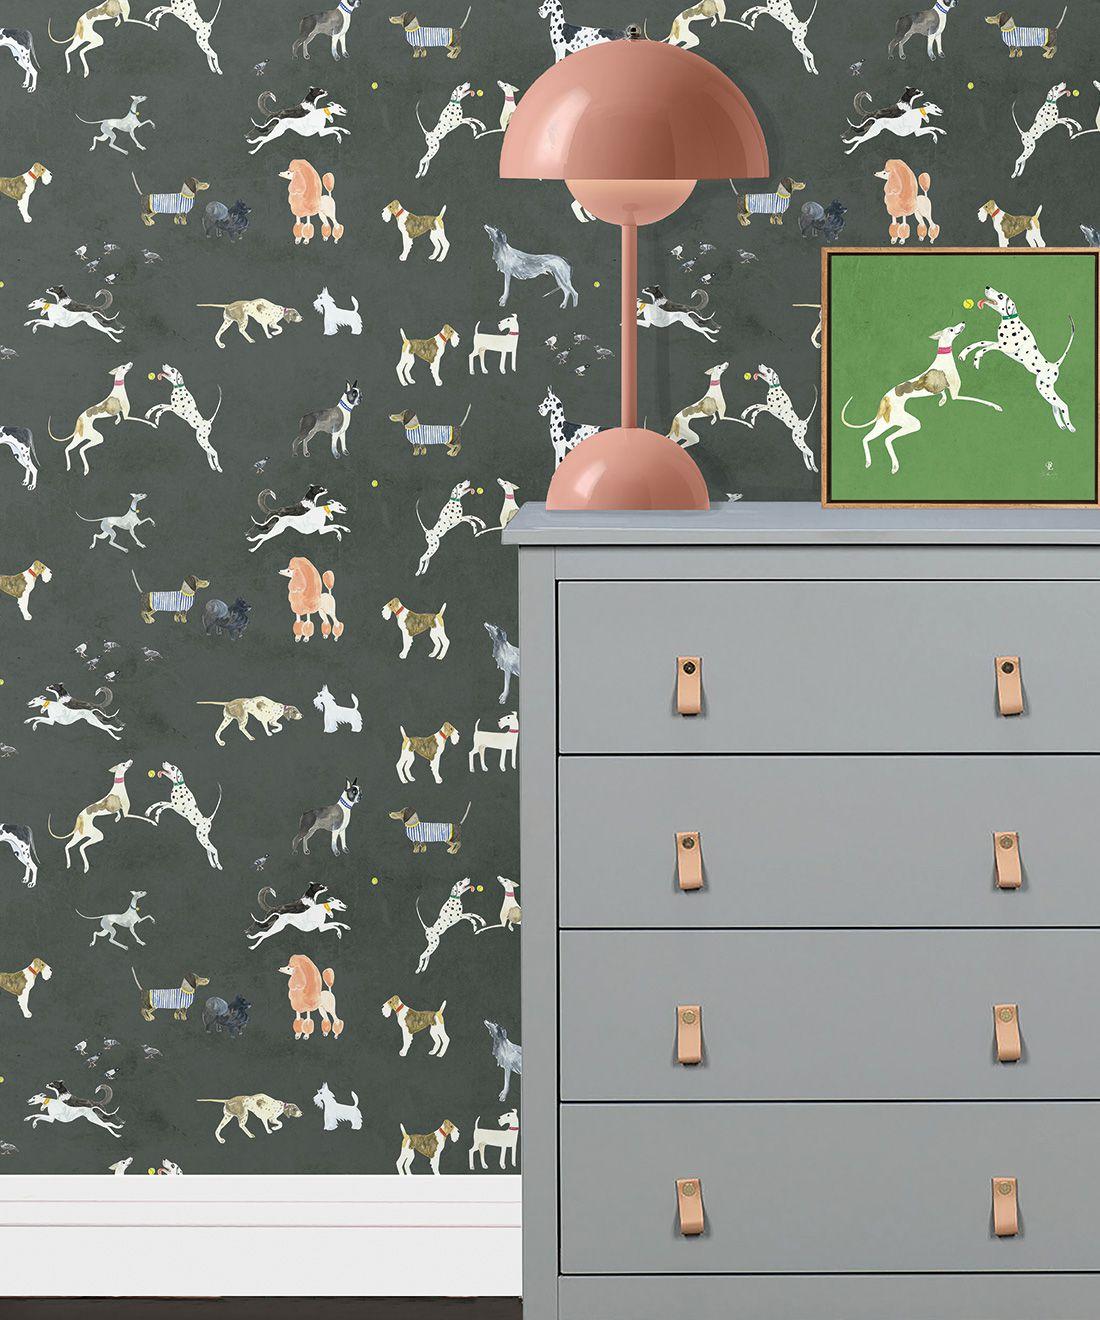 Doggies Wallpaper •Dog Wallpaper •Charcoal • Insitu with Lamp